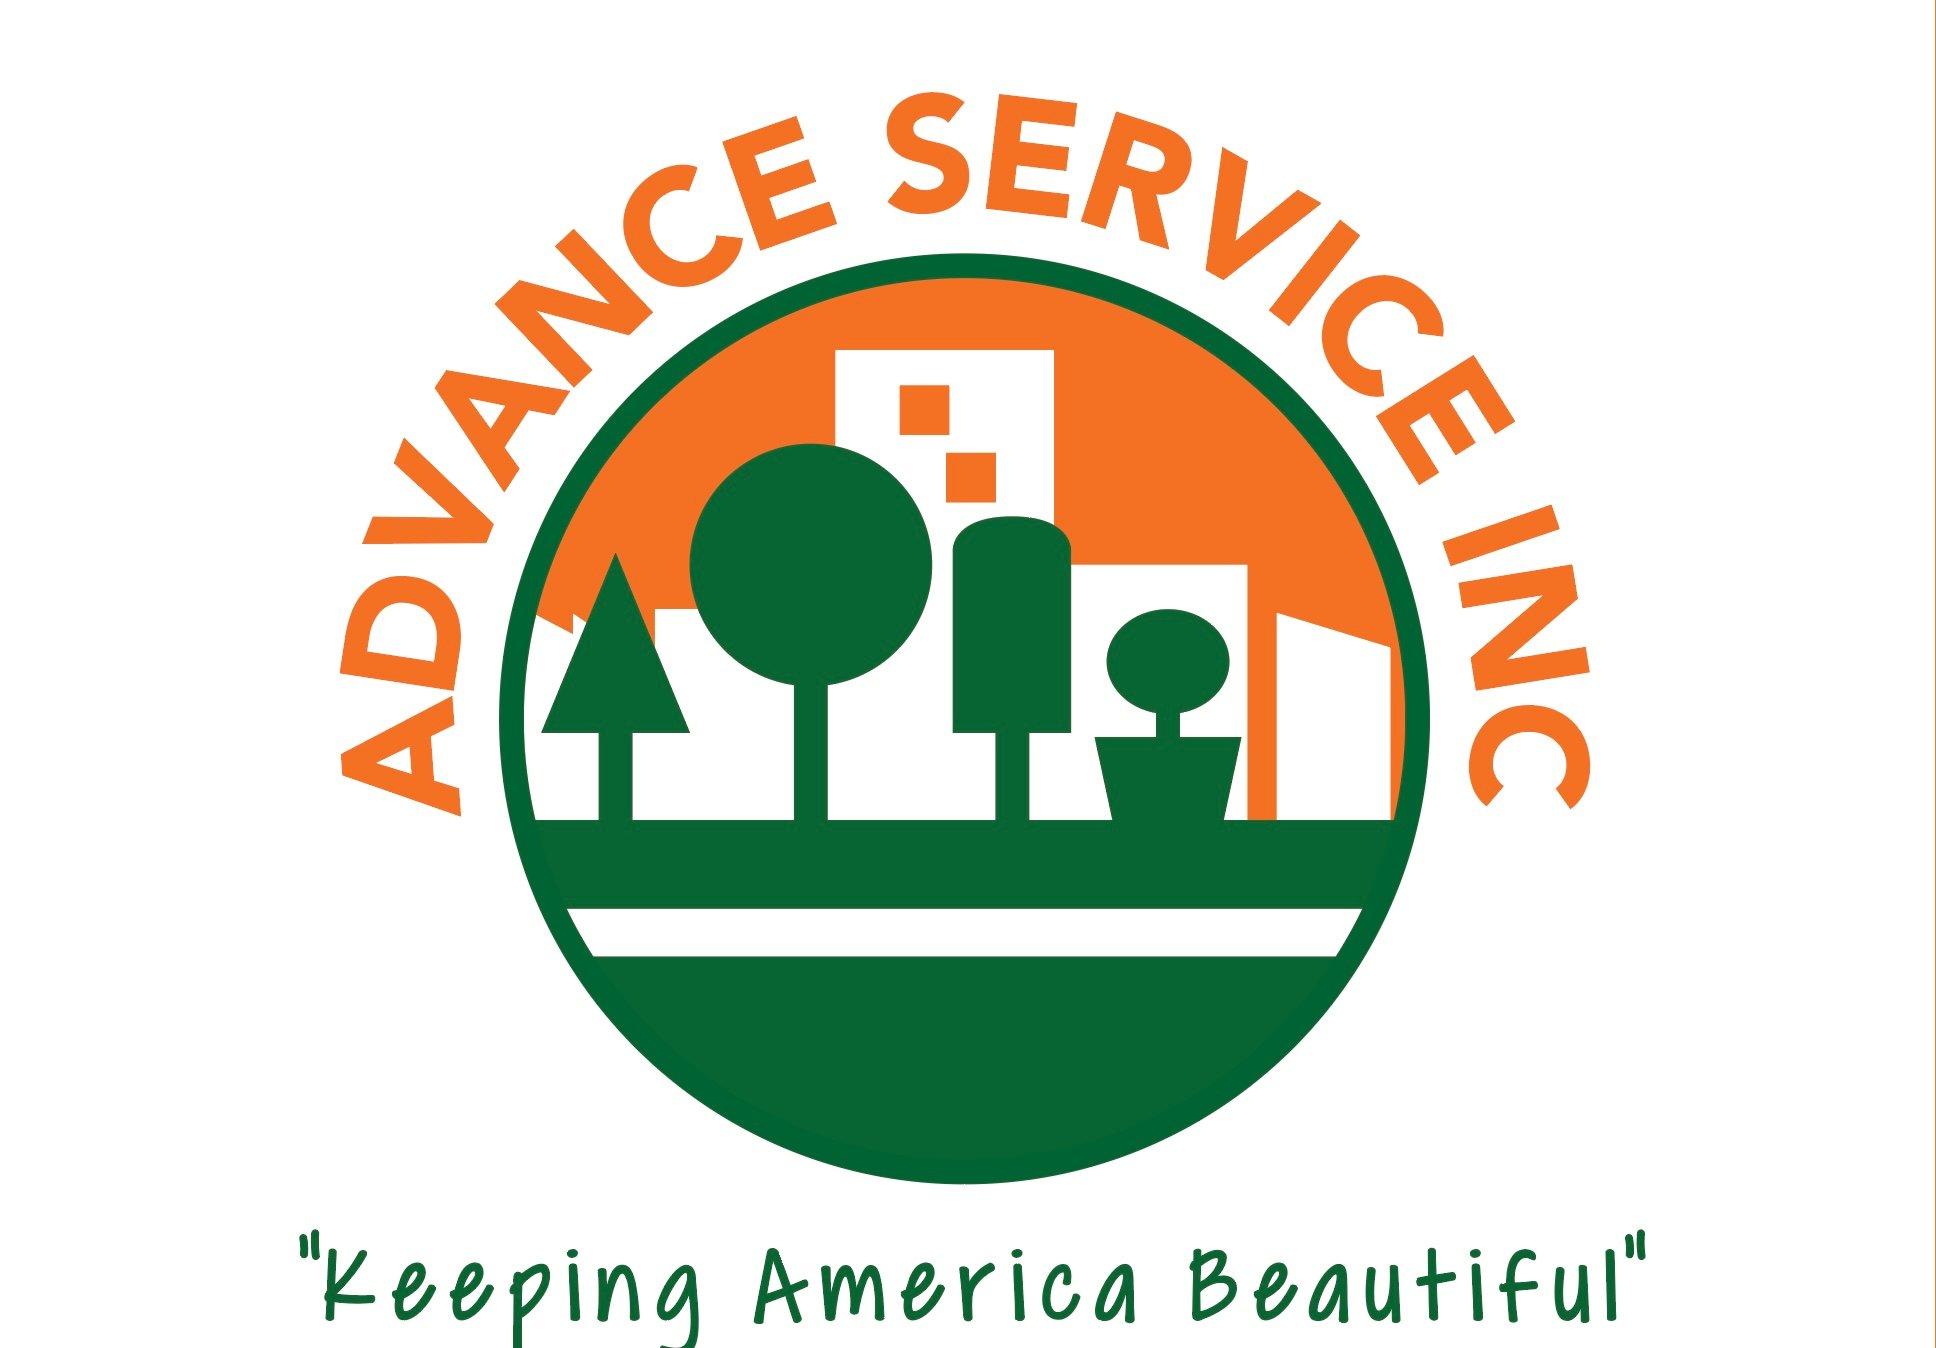 Advance Service Inc